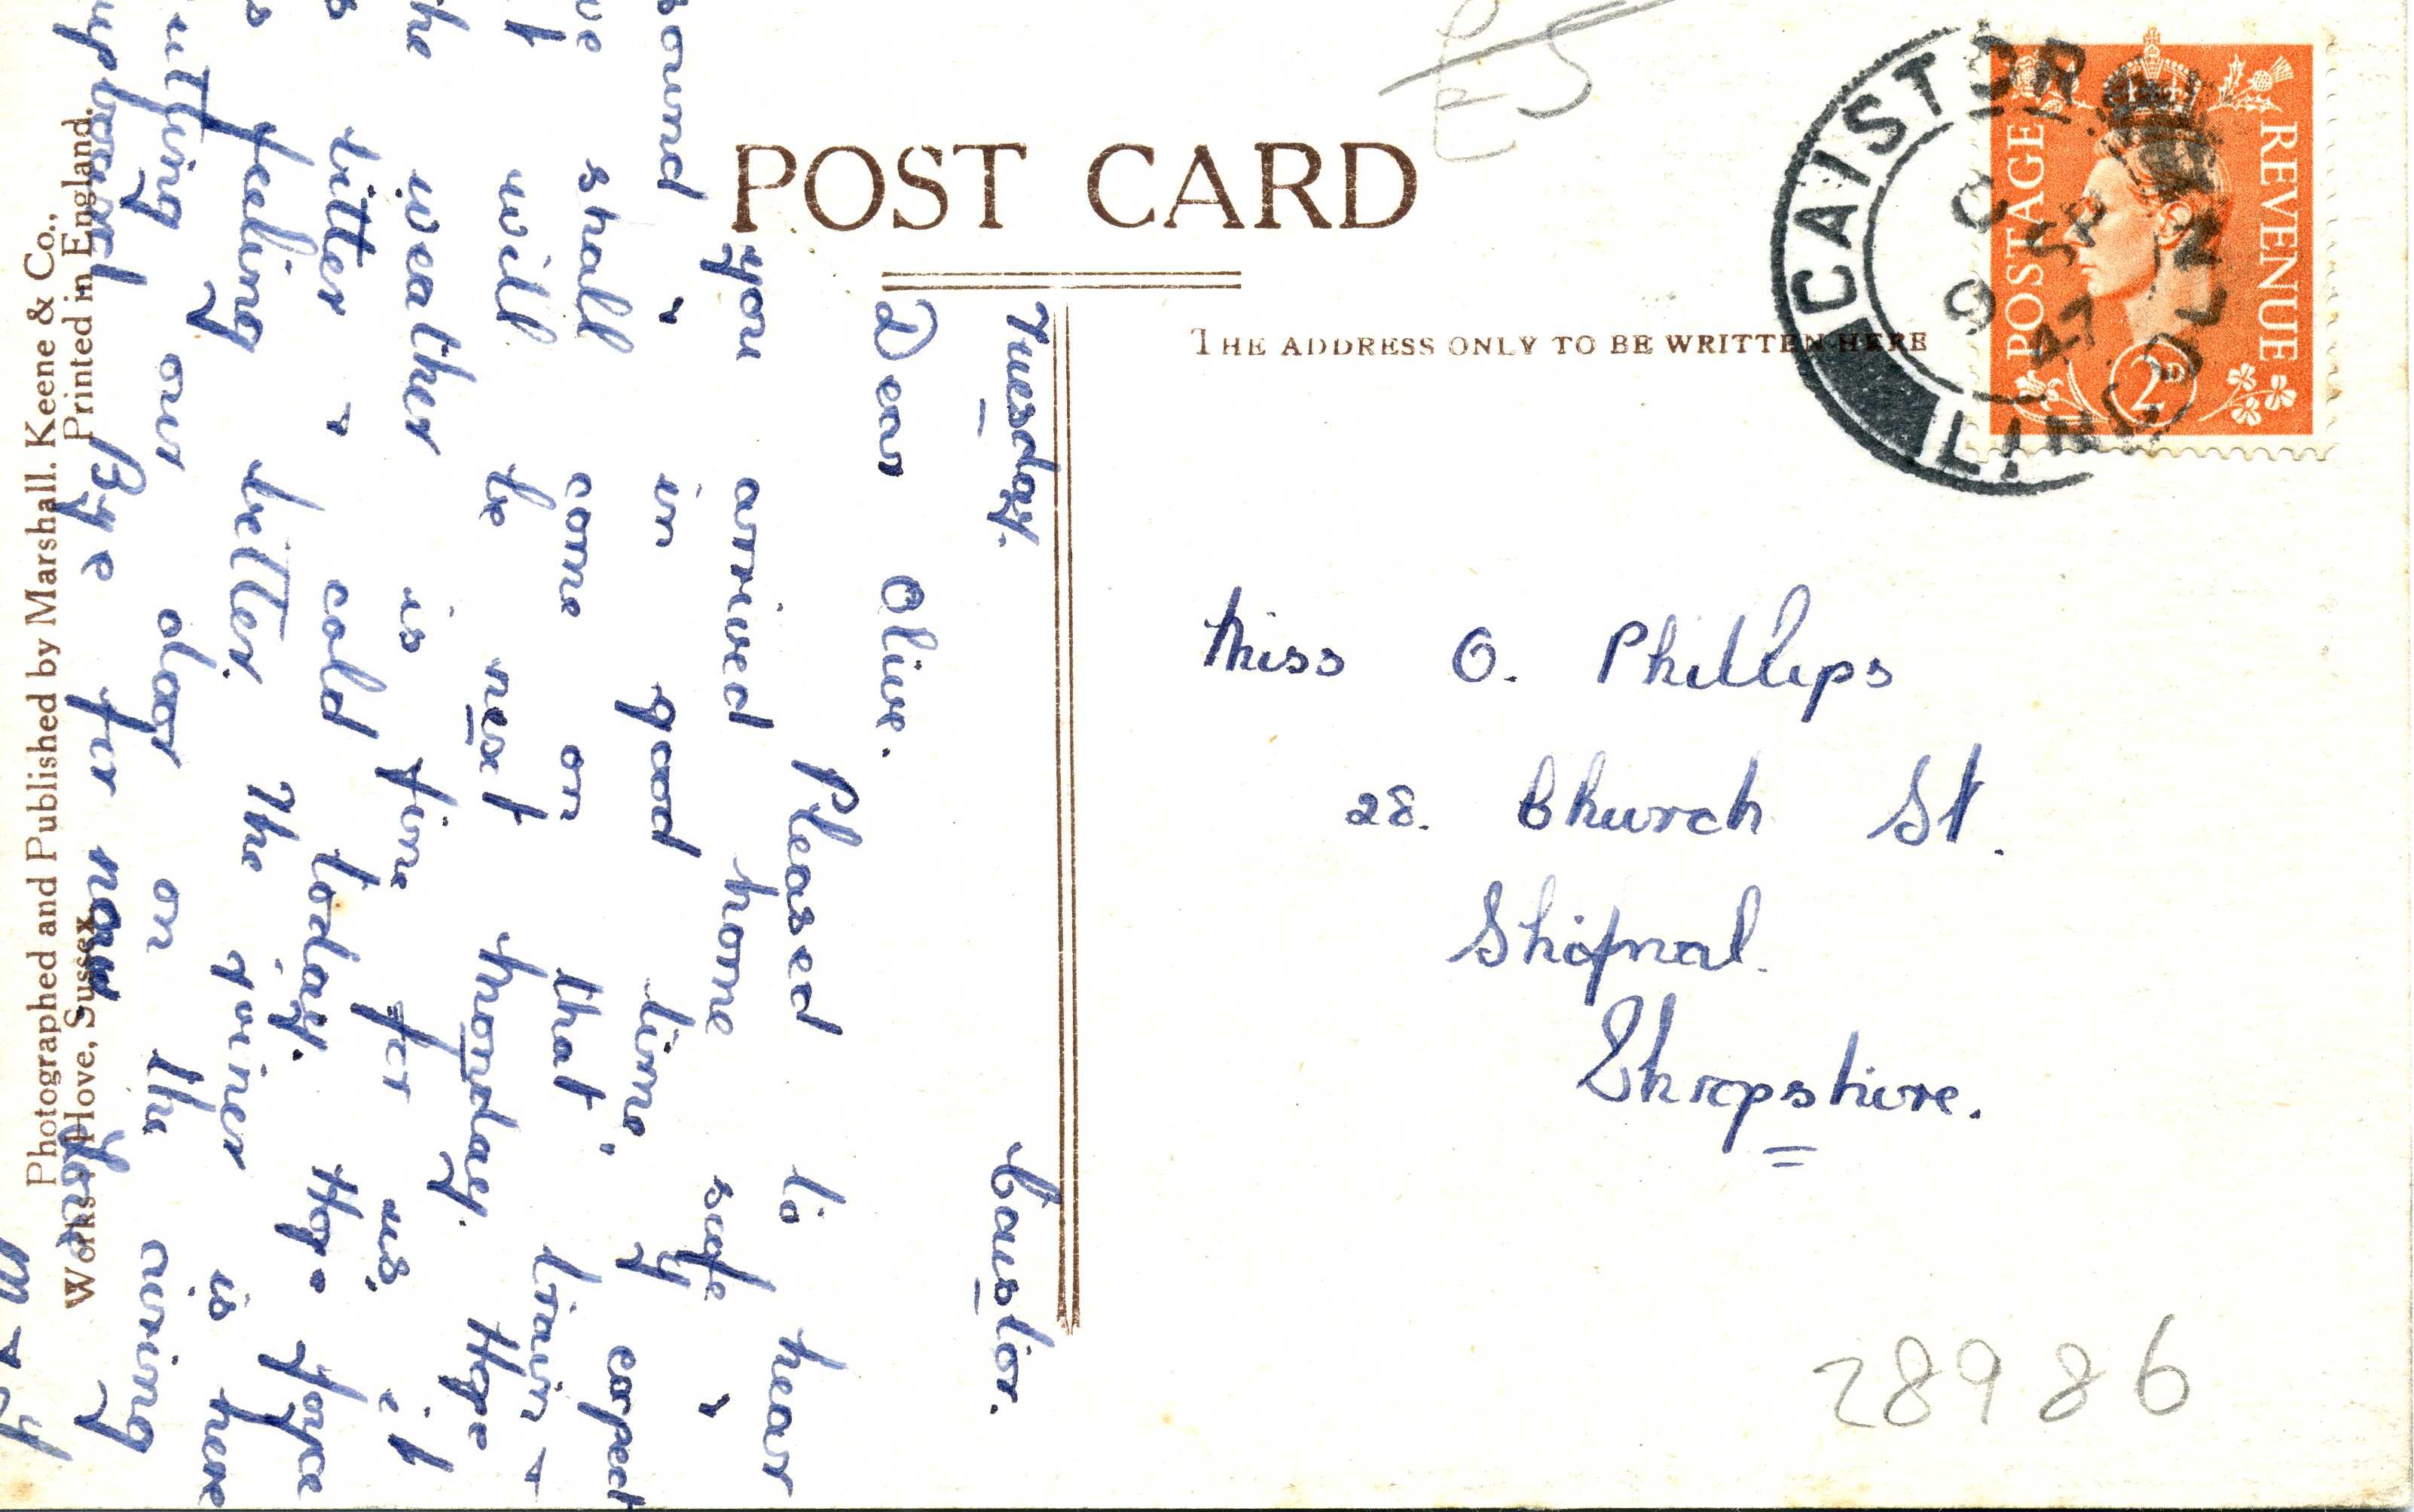 Postcard 1947 Casterby House016.jpg